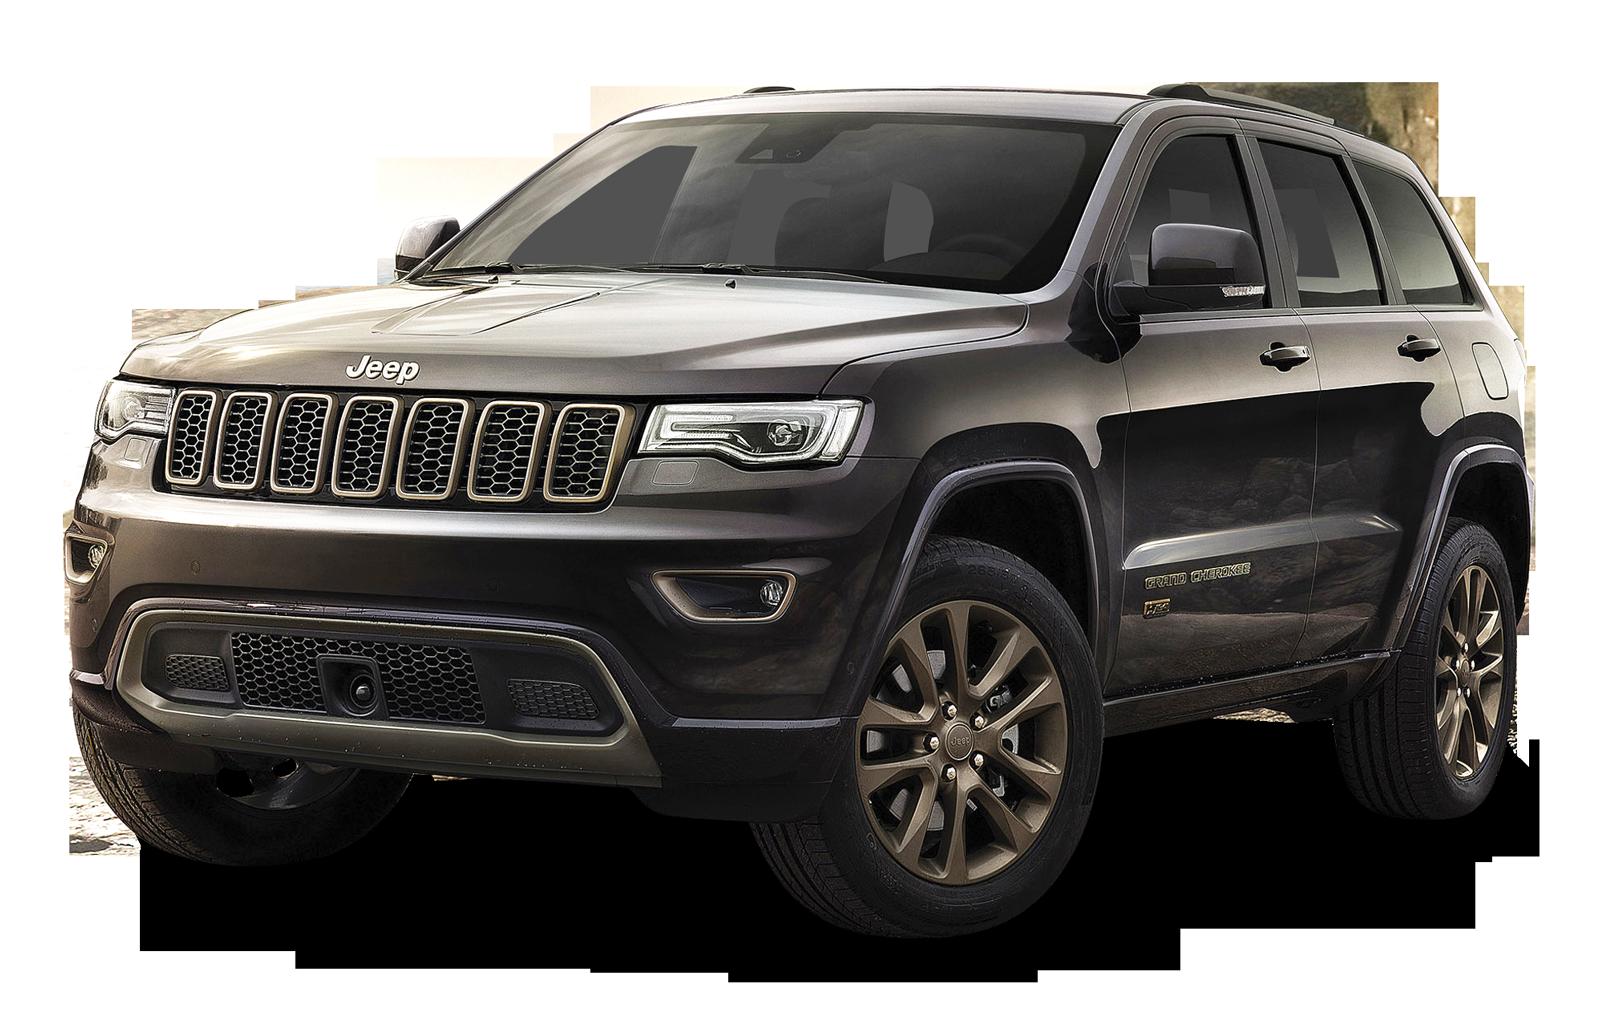 Black Jeep Grand Cherokee Car